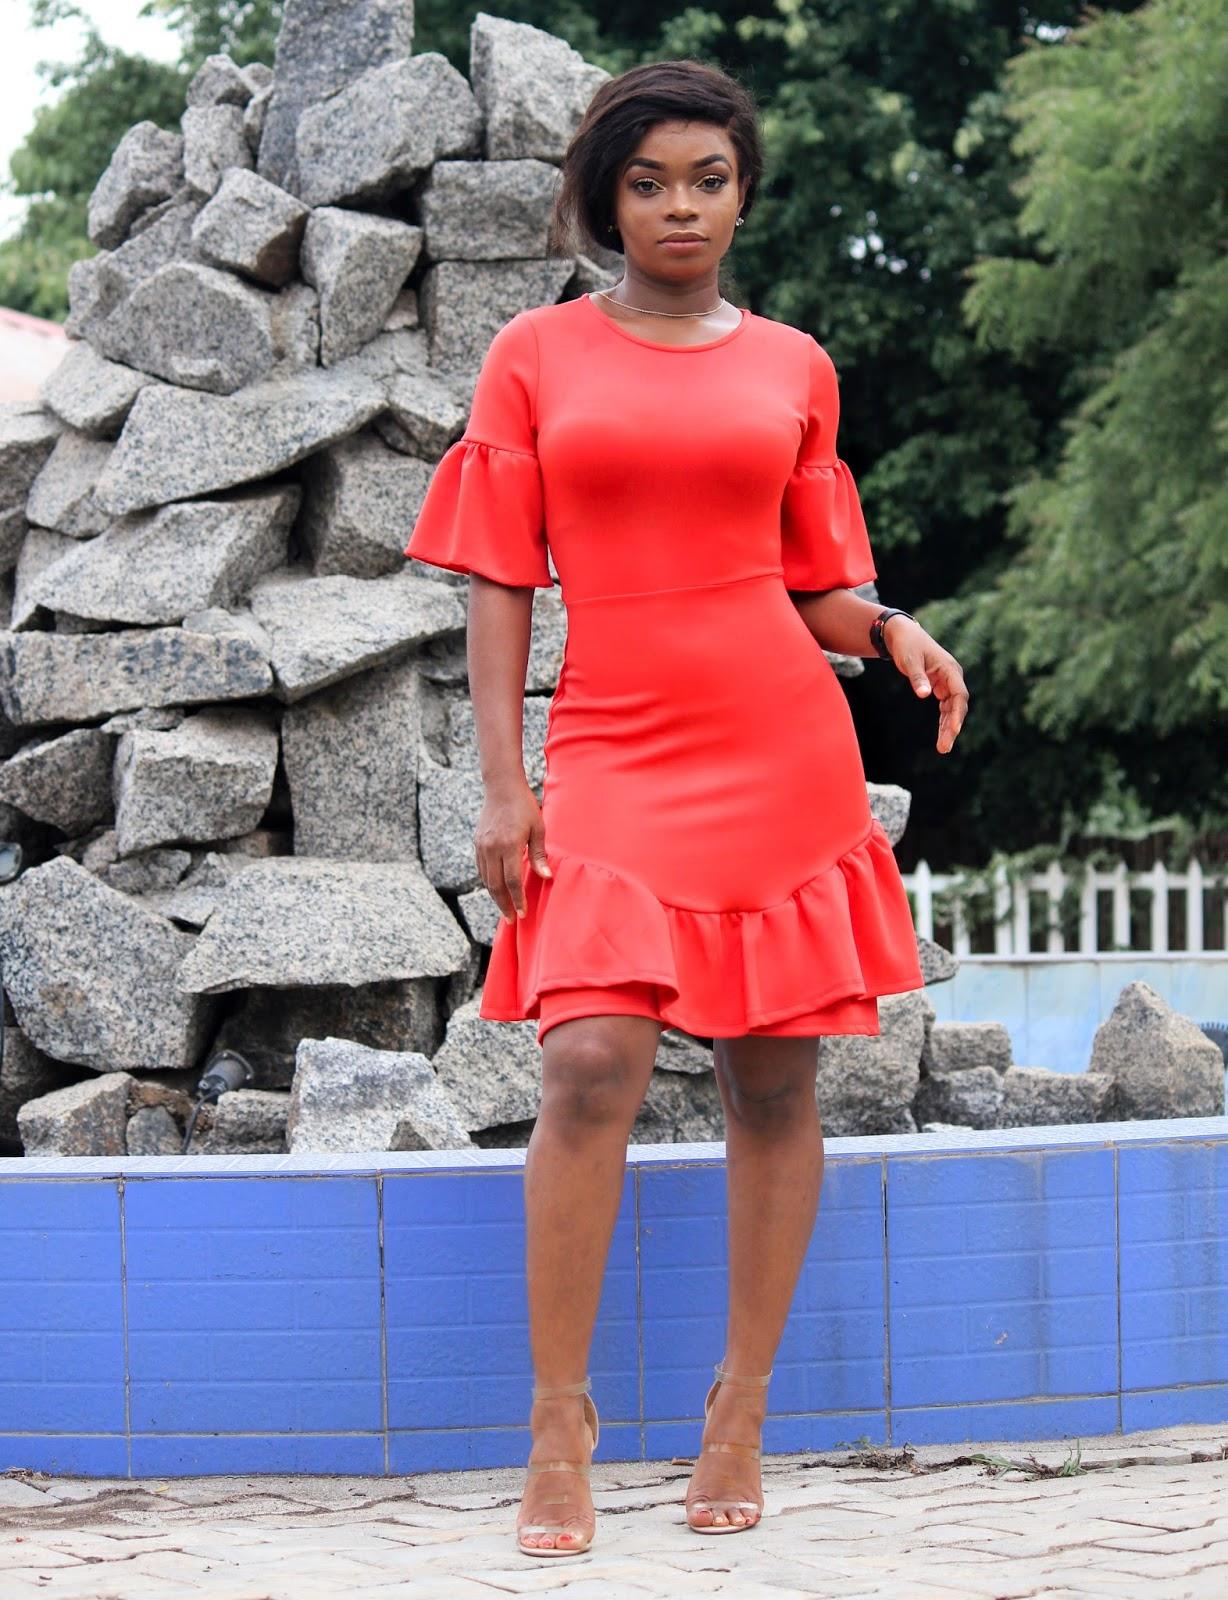 LAYERED RUFFLED HEM DRESS - Red Layered Ruffle Hem Dress from Elabelz